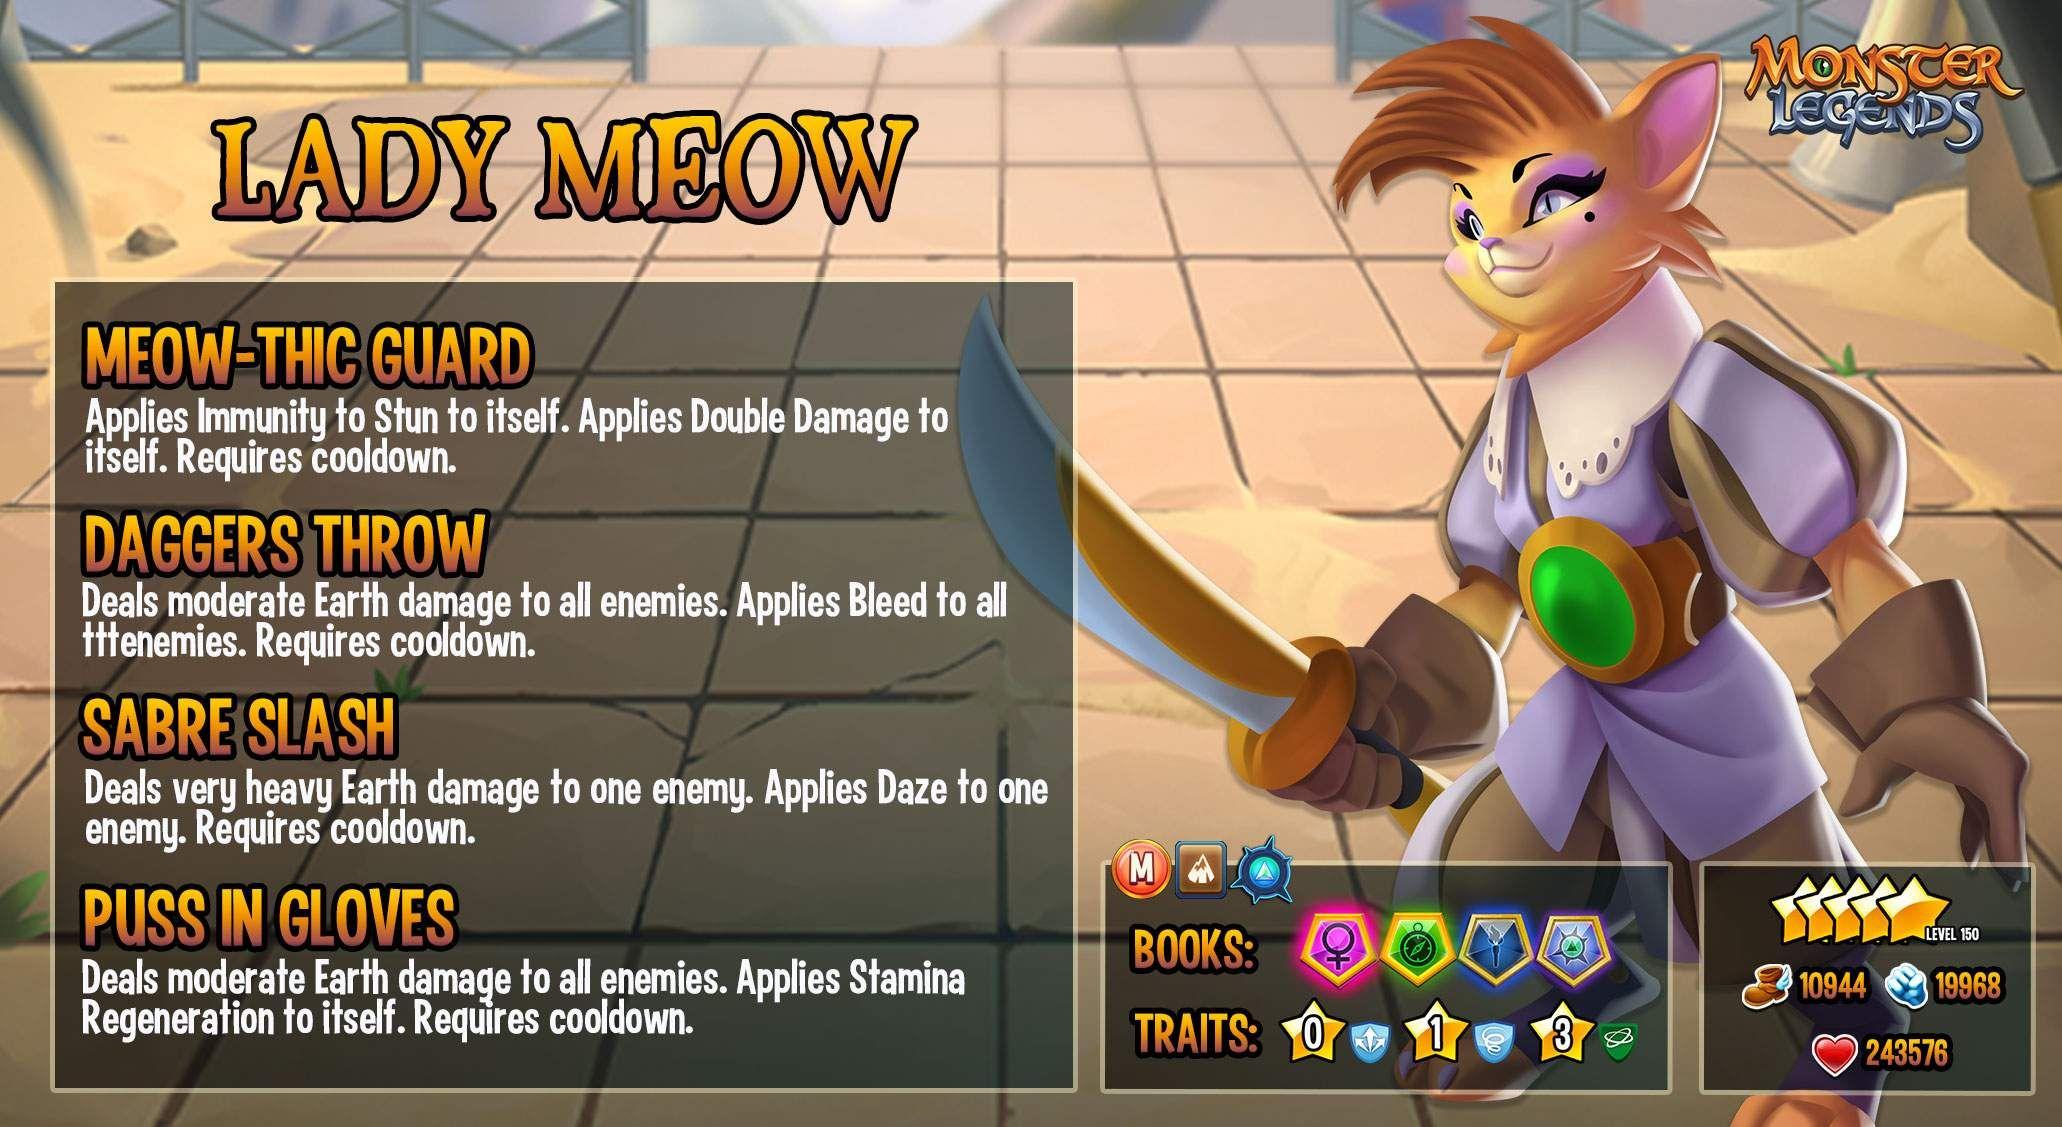 0_1614693973350_Lady-Meow.jpg